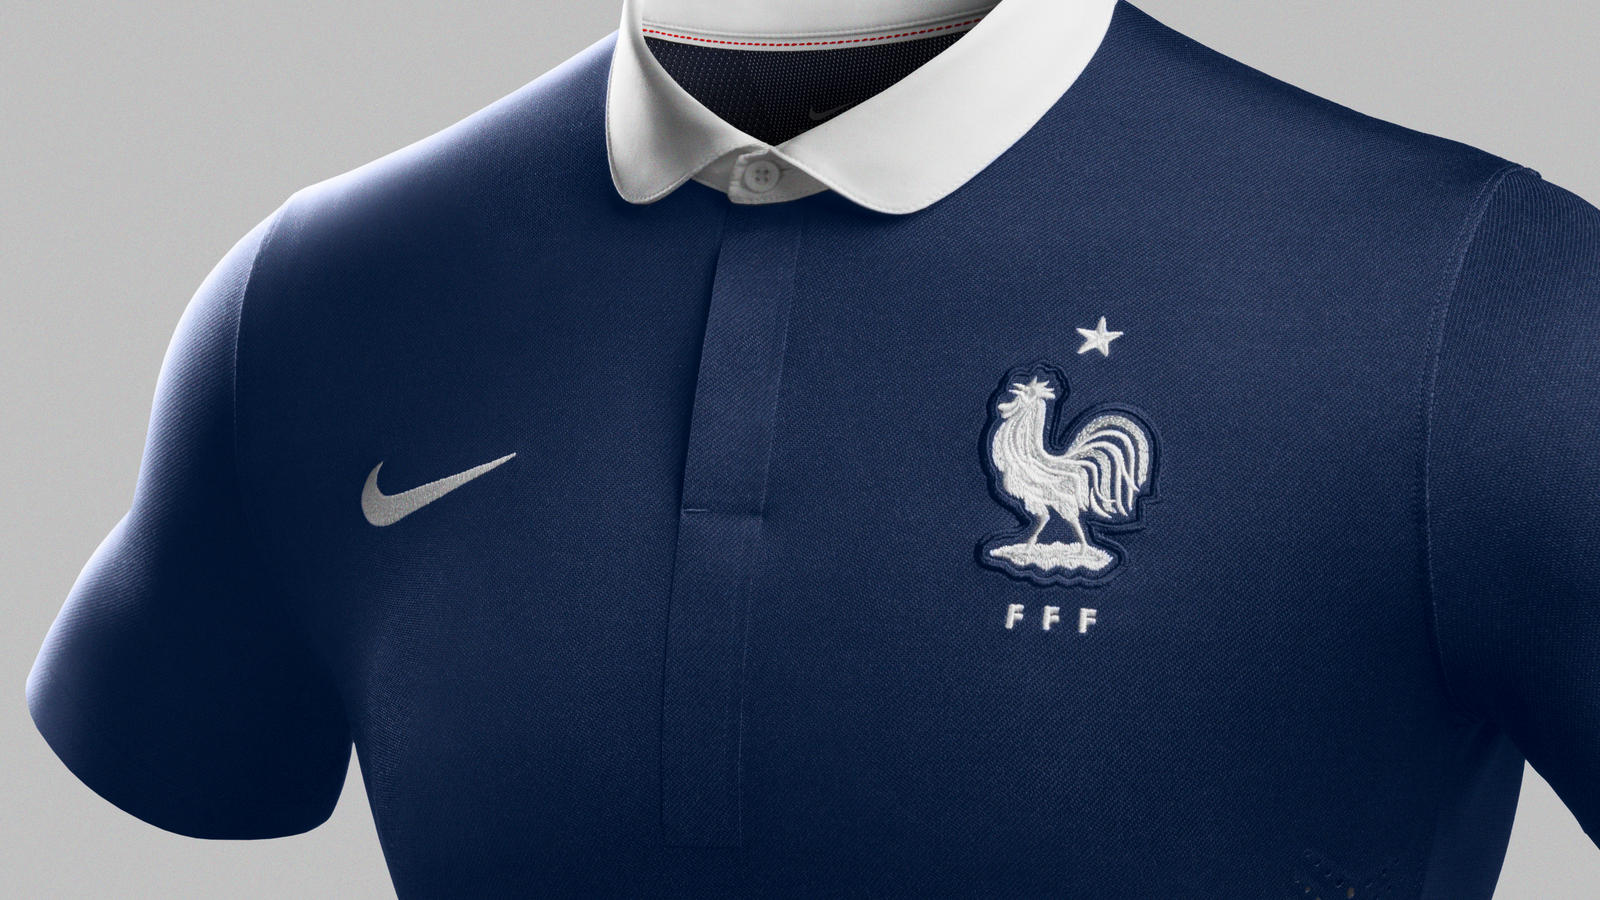 new styles c9aa0 cd01d Nike Unveils 2014 France Kit - Nike News